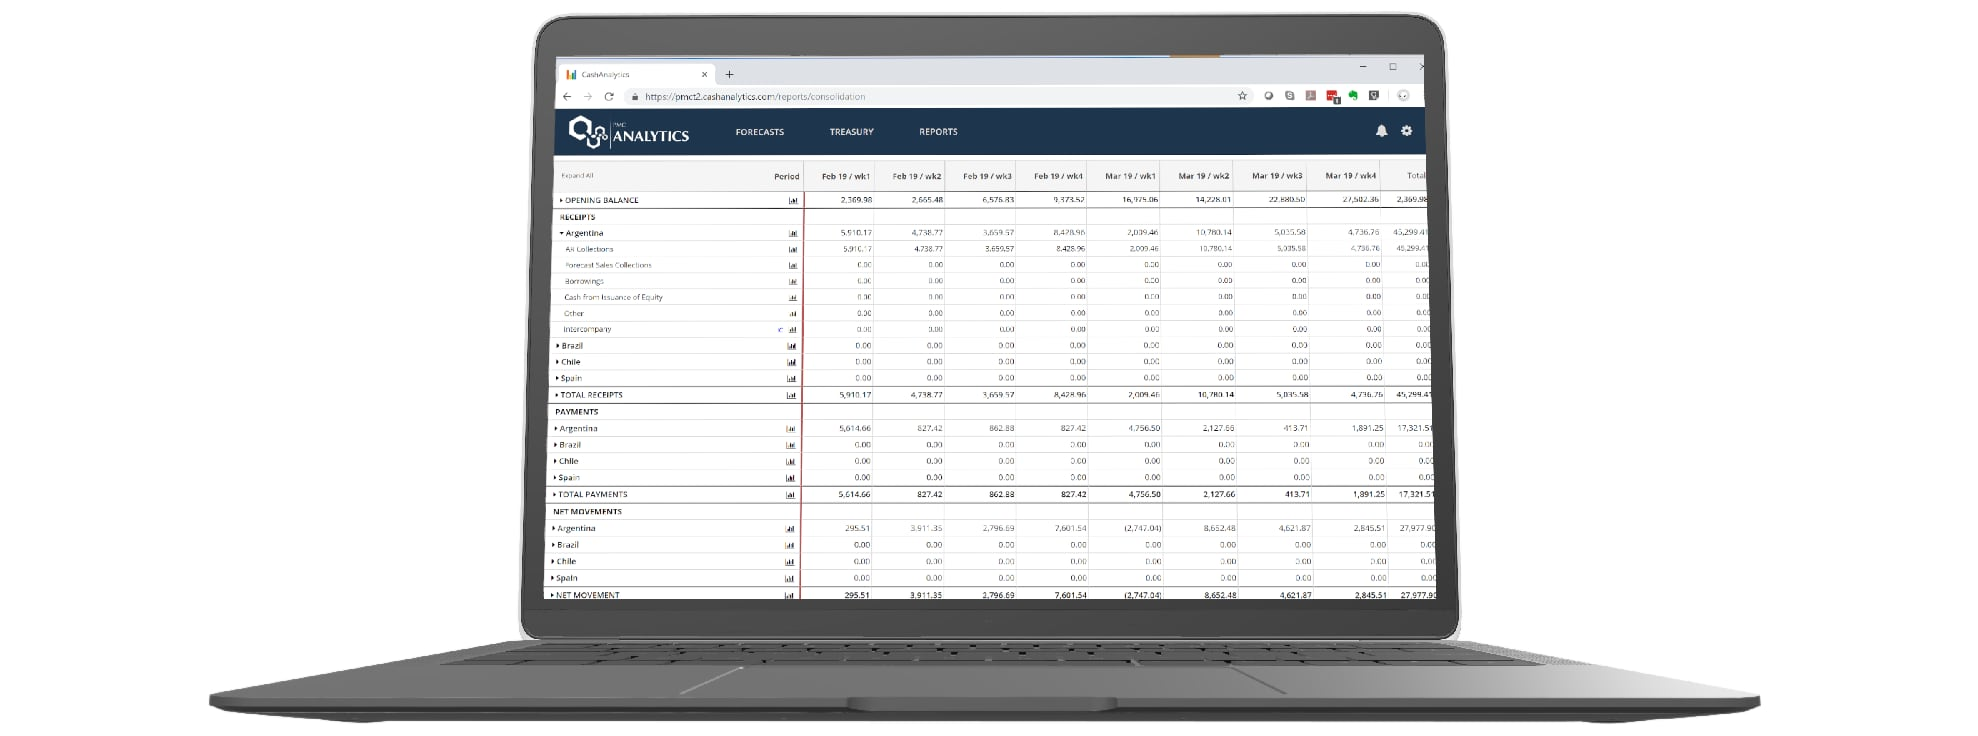 Cash Management - Liquidity Screenshot